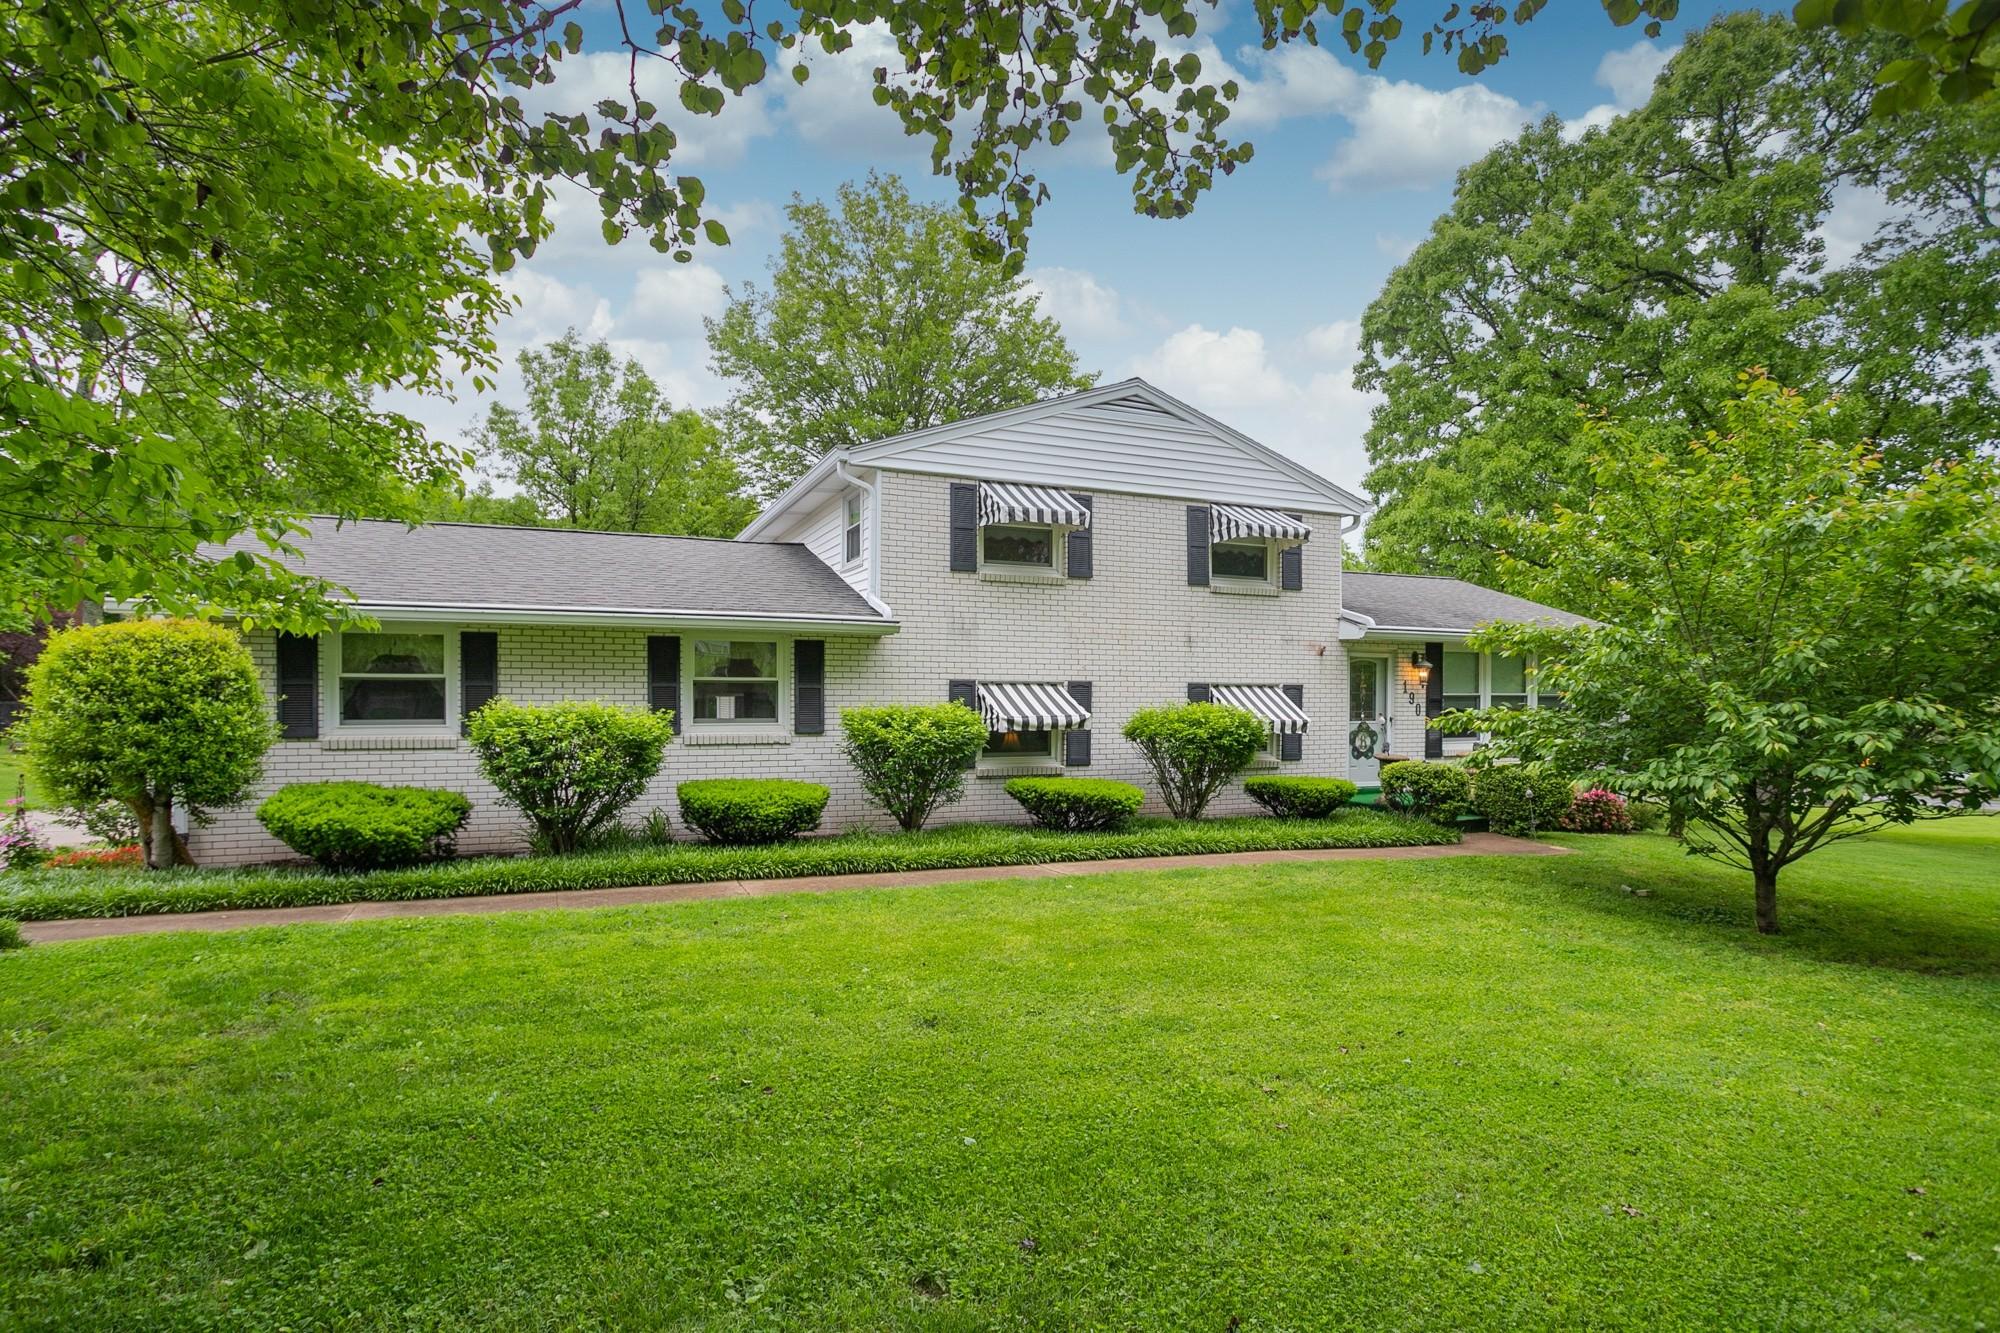 190 Rebecca Dr Property Photo - Hendersonville, TN real estate listing